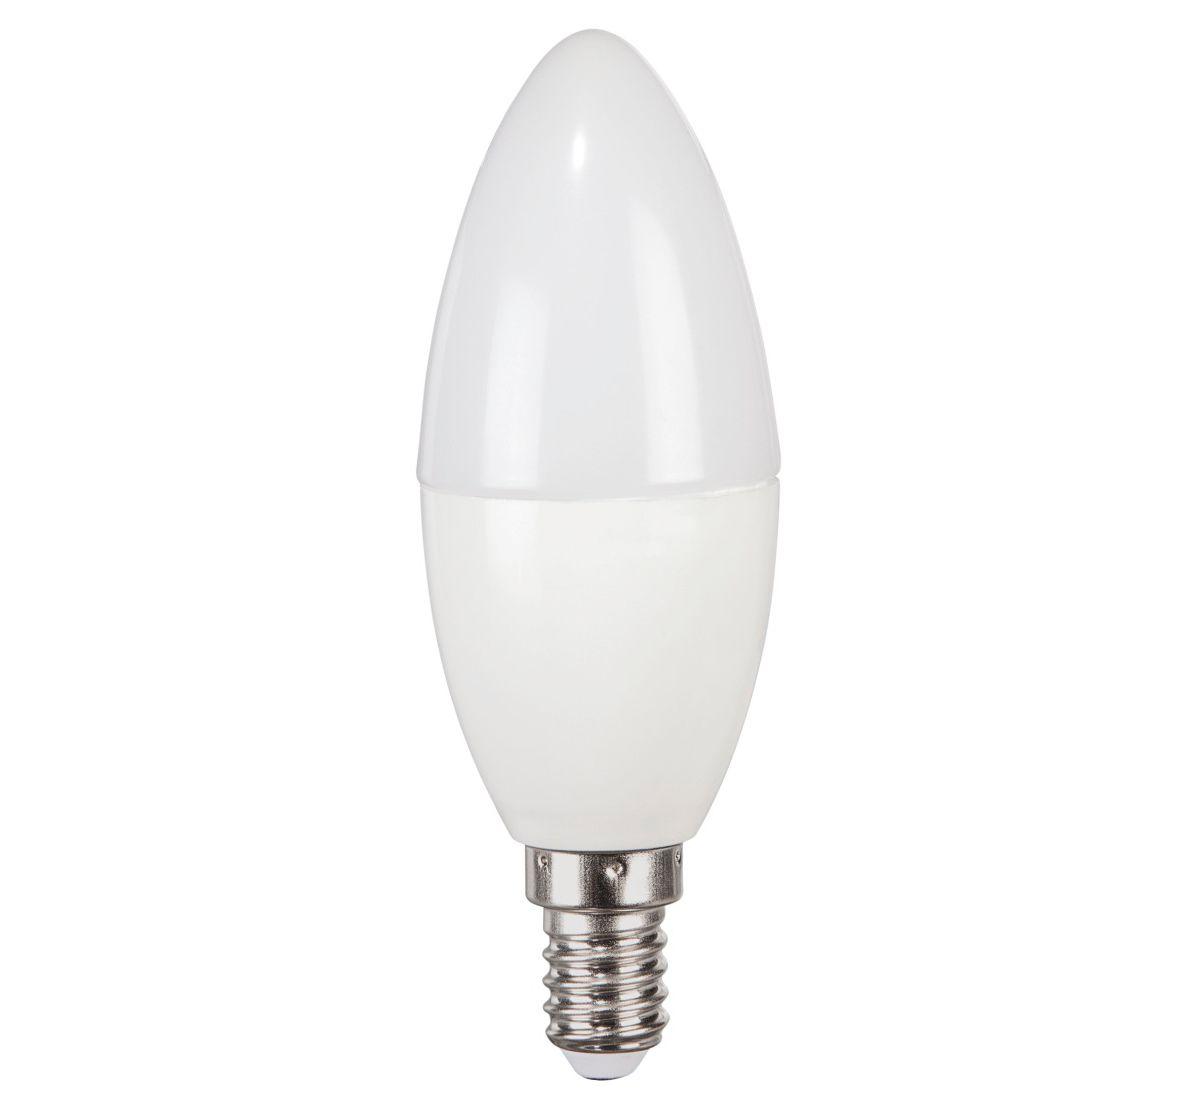 Xavax LED-Lampe, E14, 470lm ersetzt 40W, Kerzen...